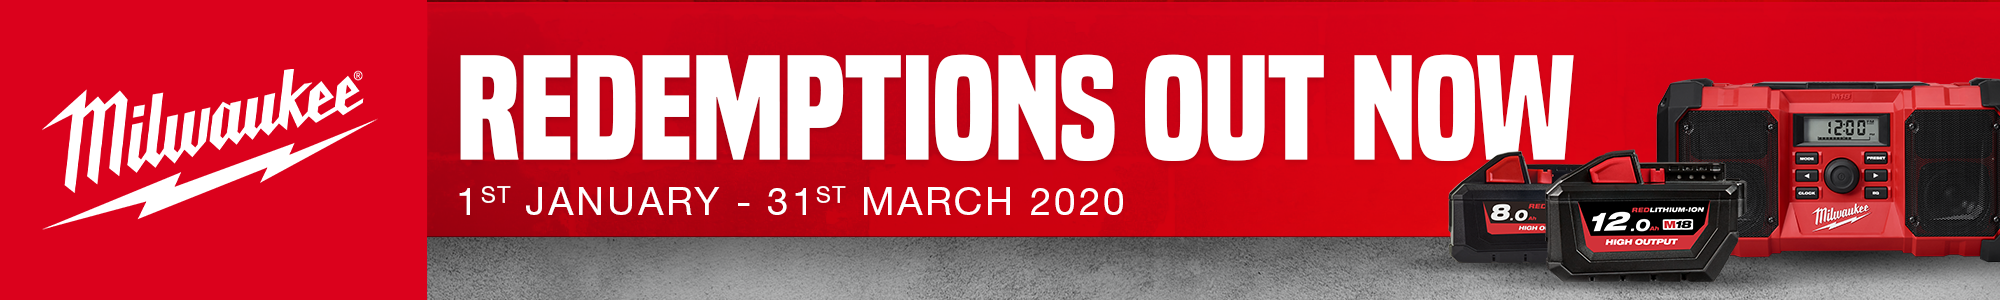 Milwaukee Redemptions Jan to Mar 2020